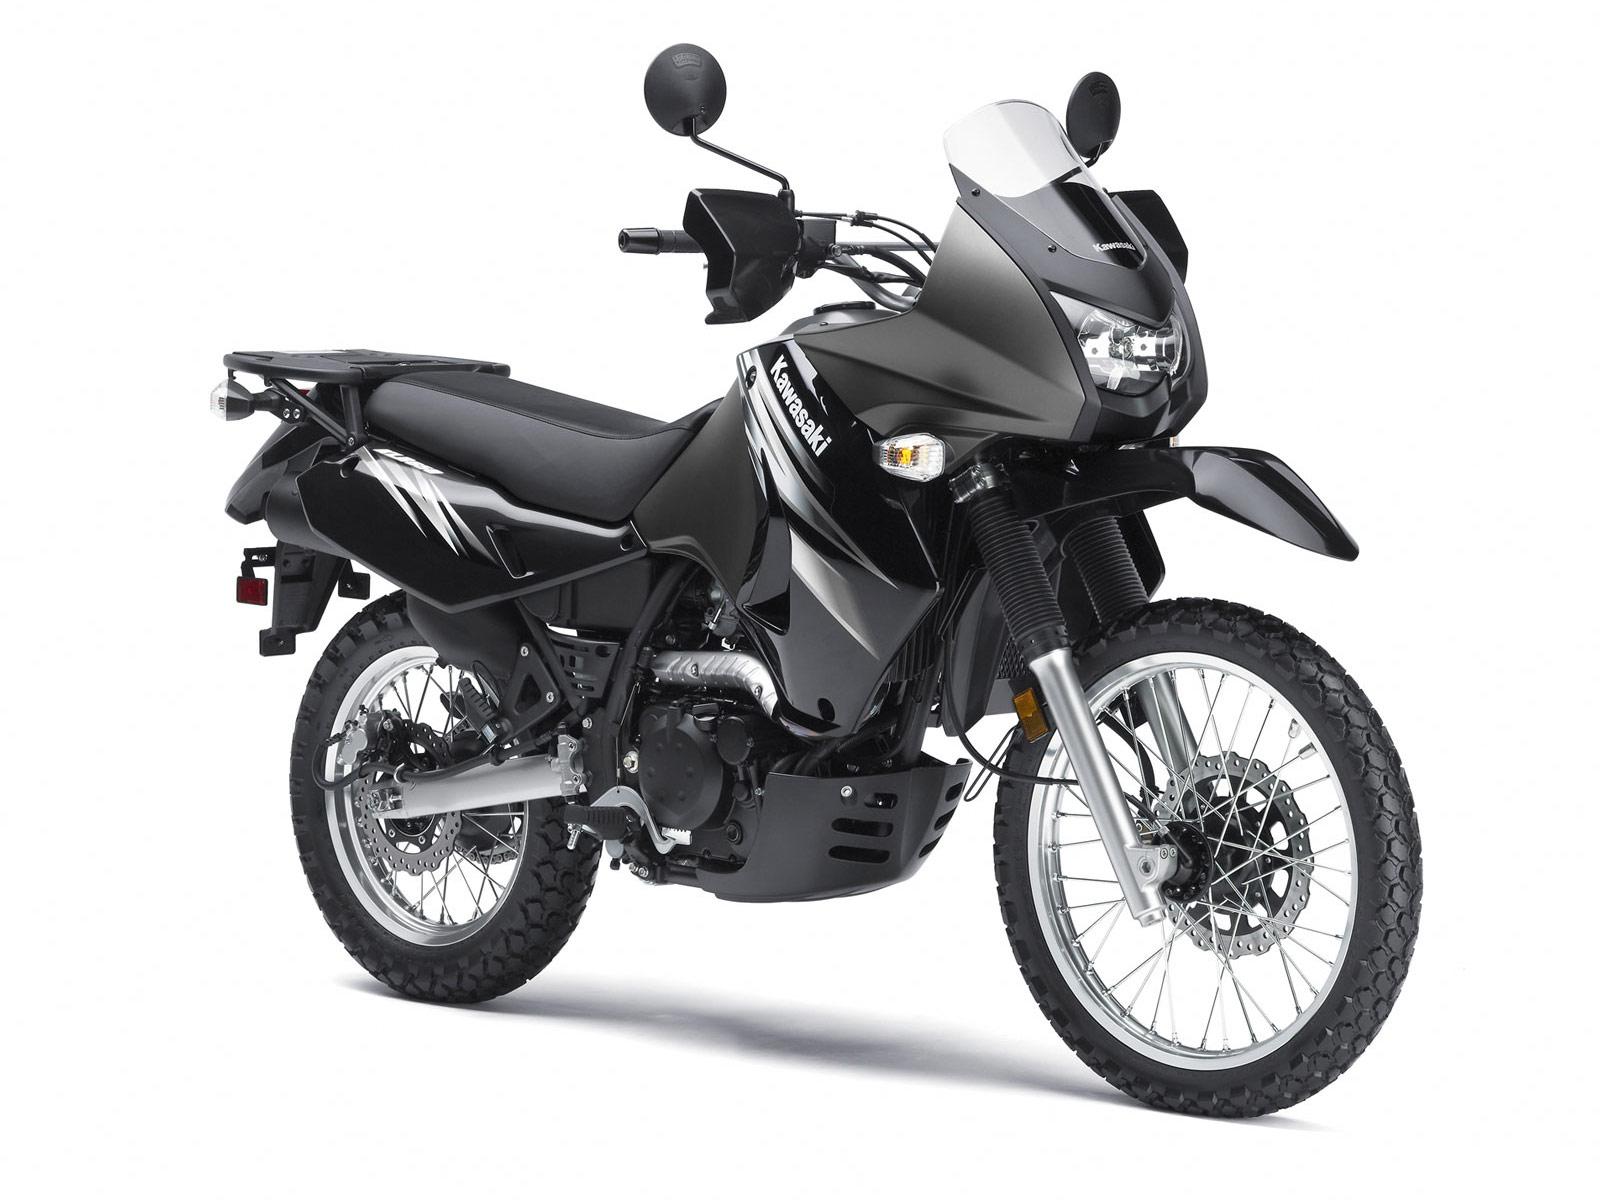 2011 KAWASAKI KLR 650 motorcycle wallpaper 1600x1200